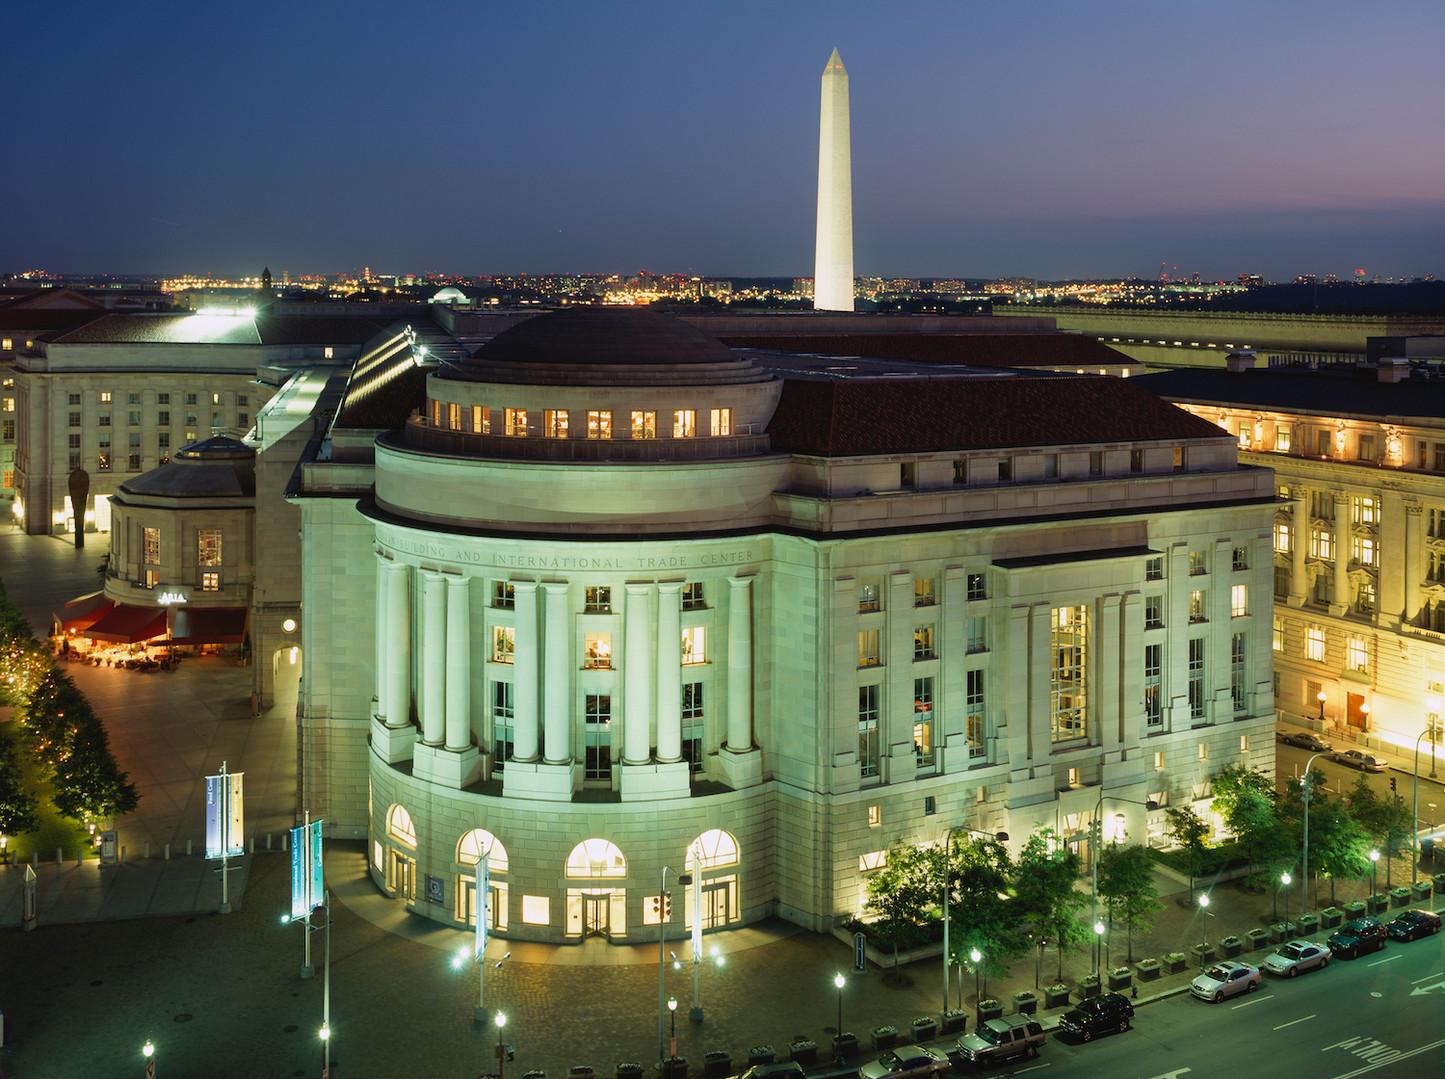 Ronald Reagan Building and International Trade Center